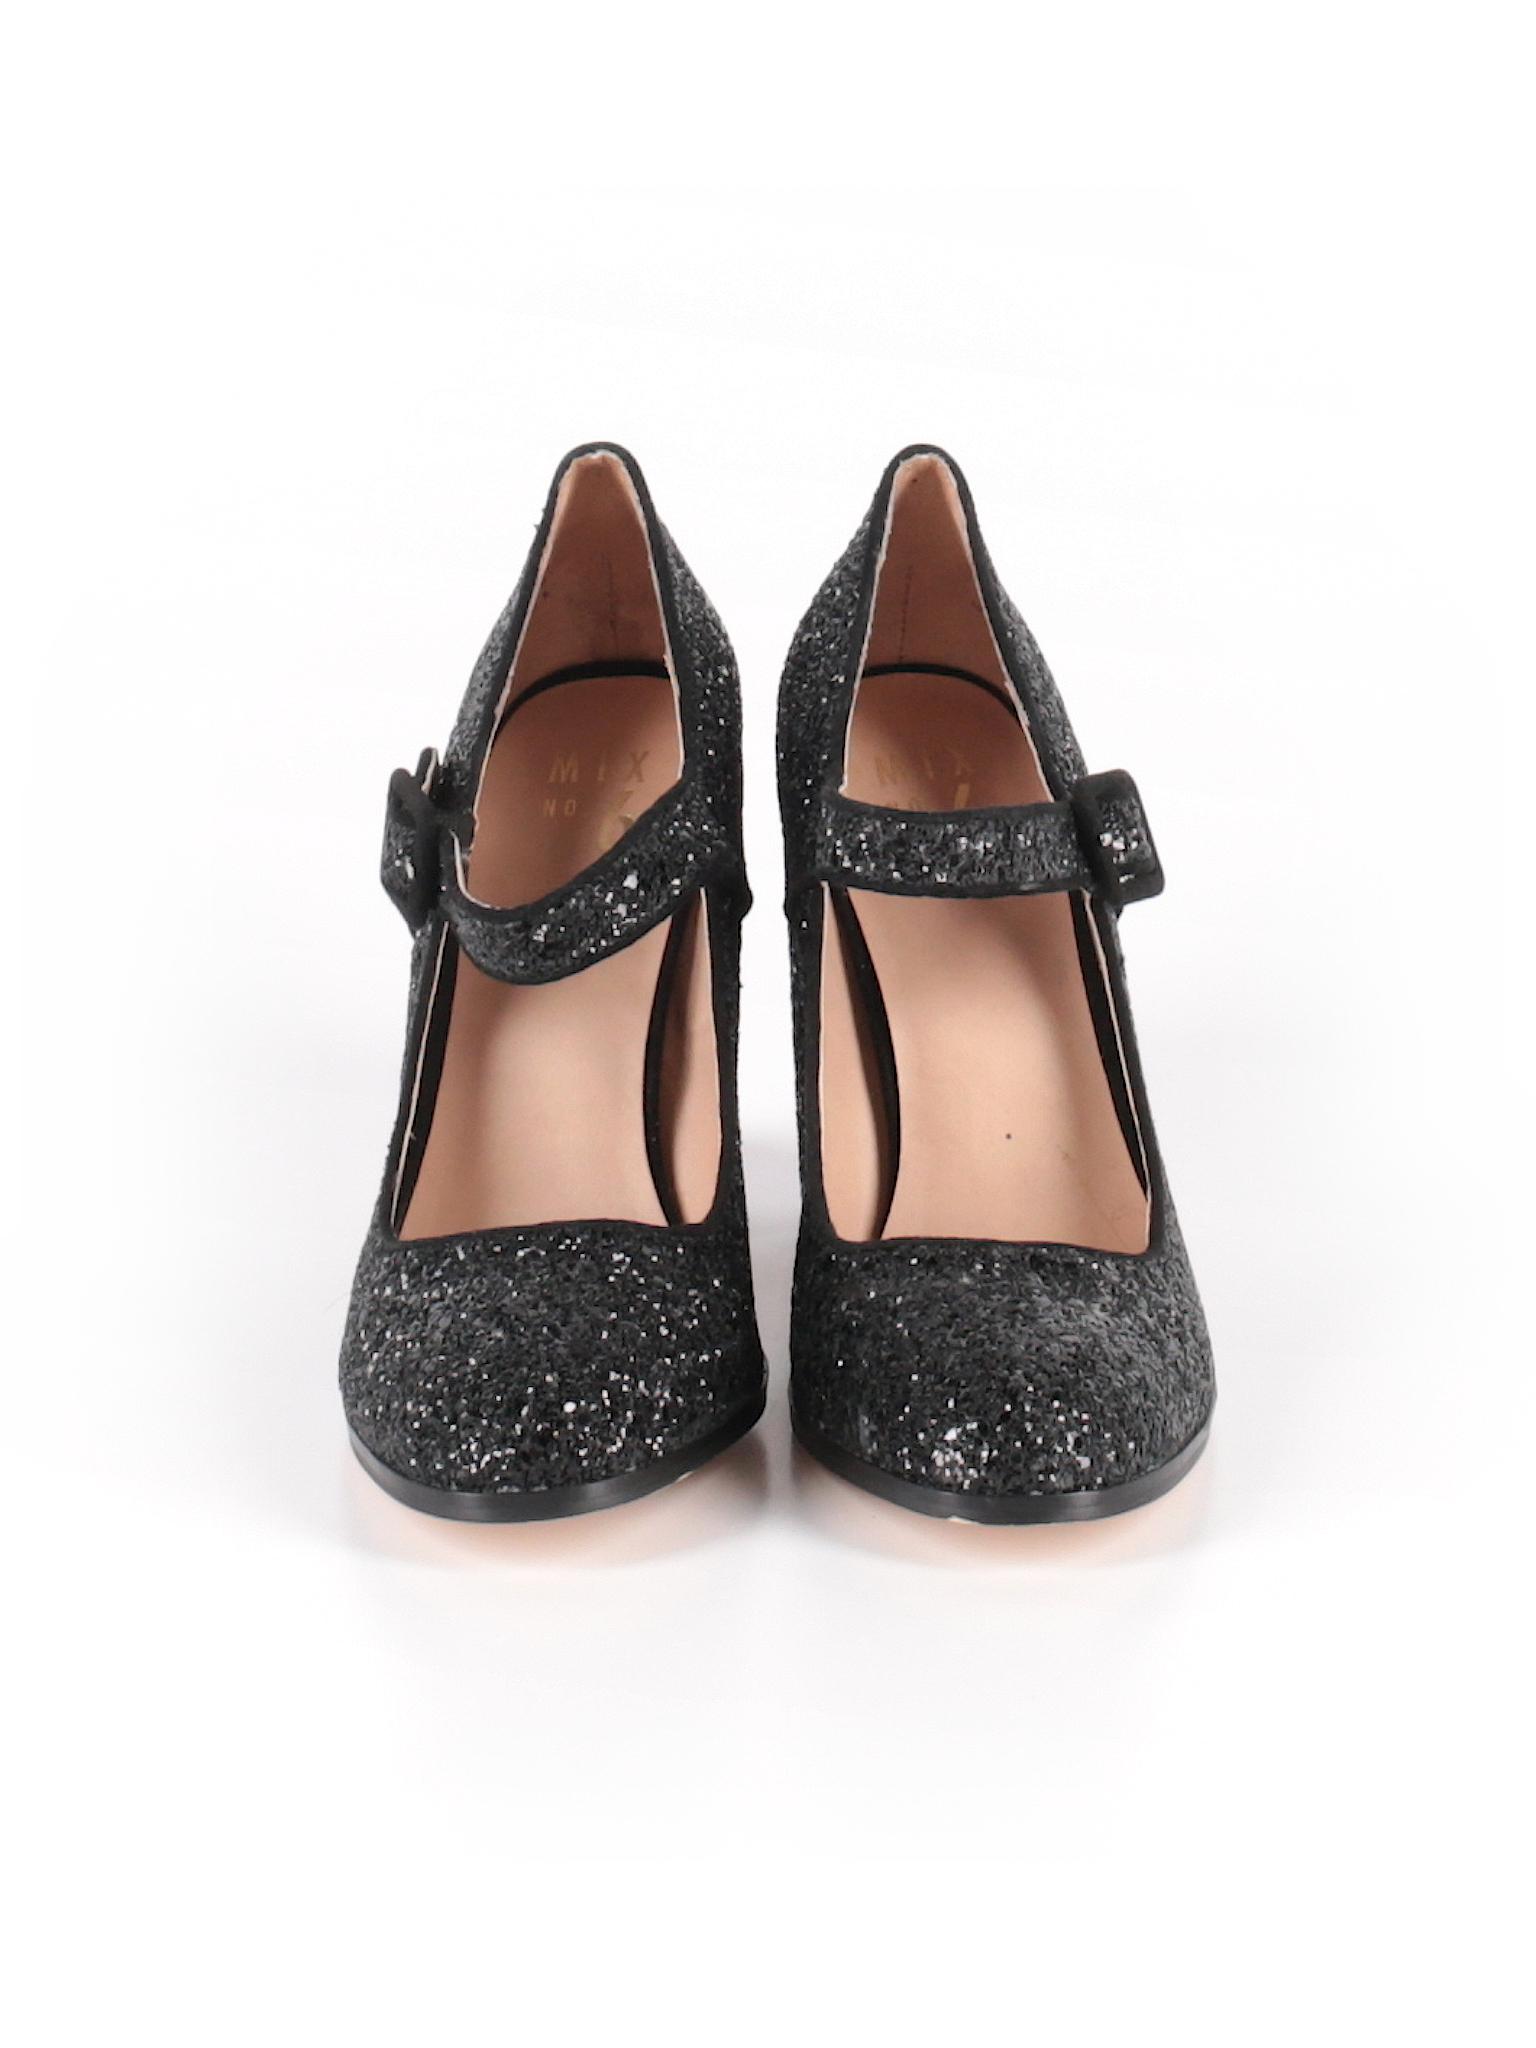 promotion Heels No 6 Mix Boutique fqdYf